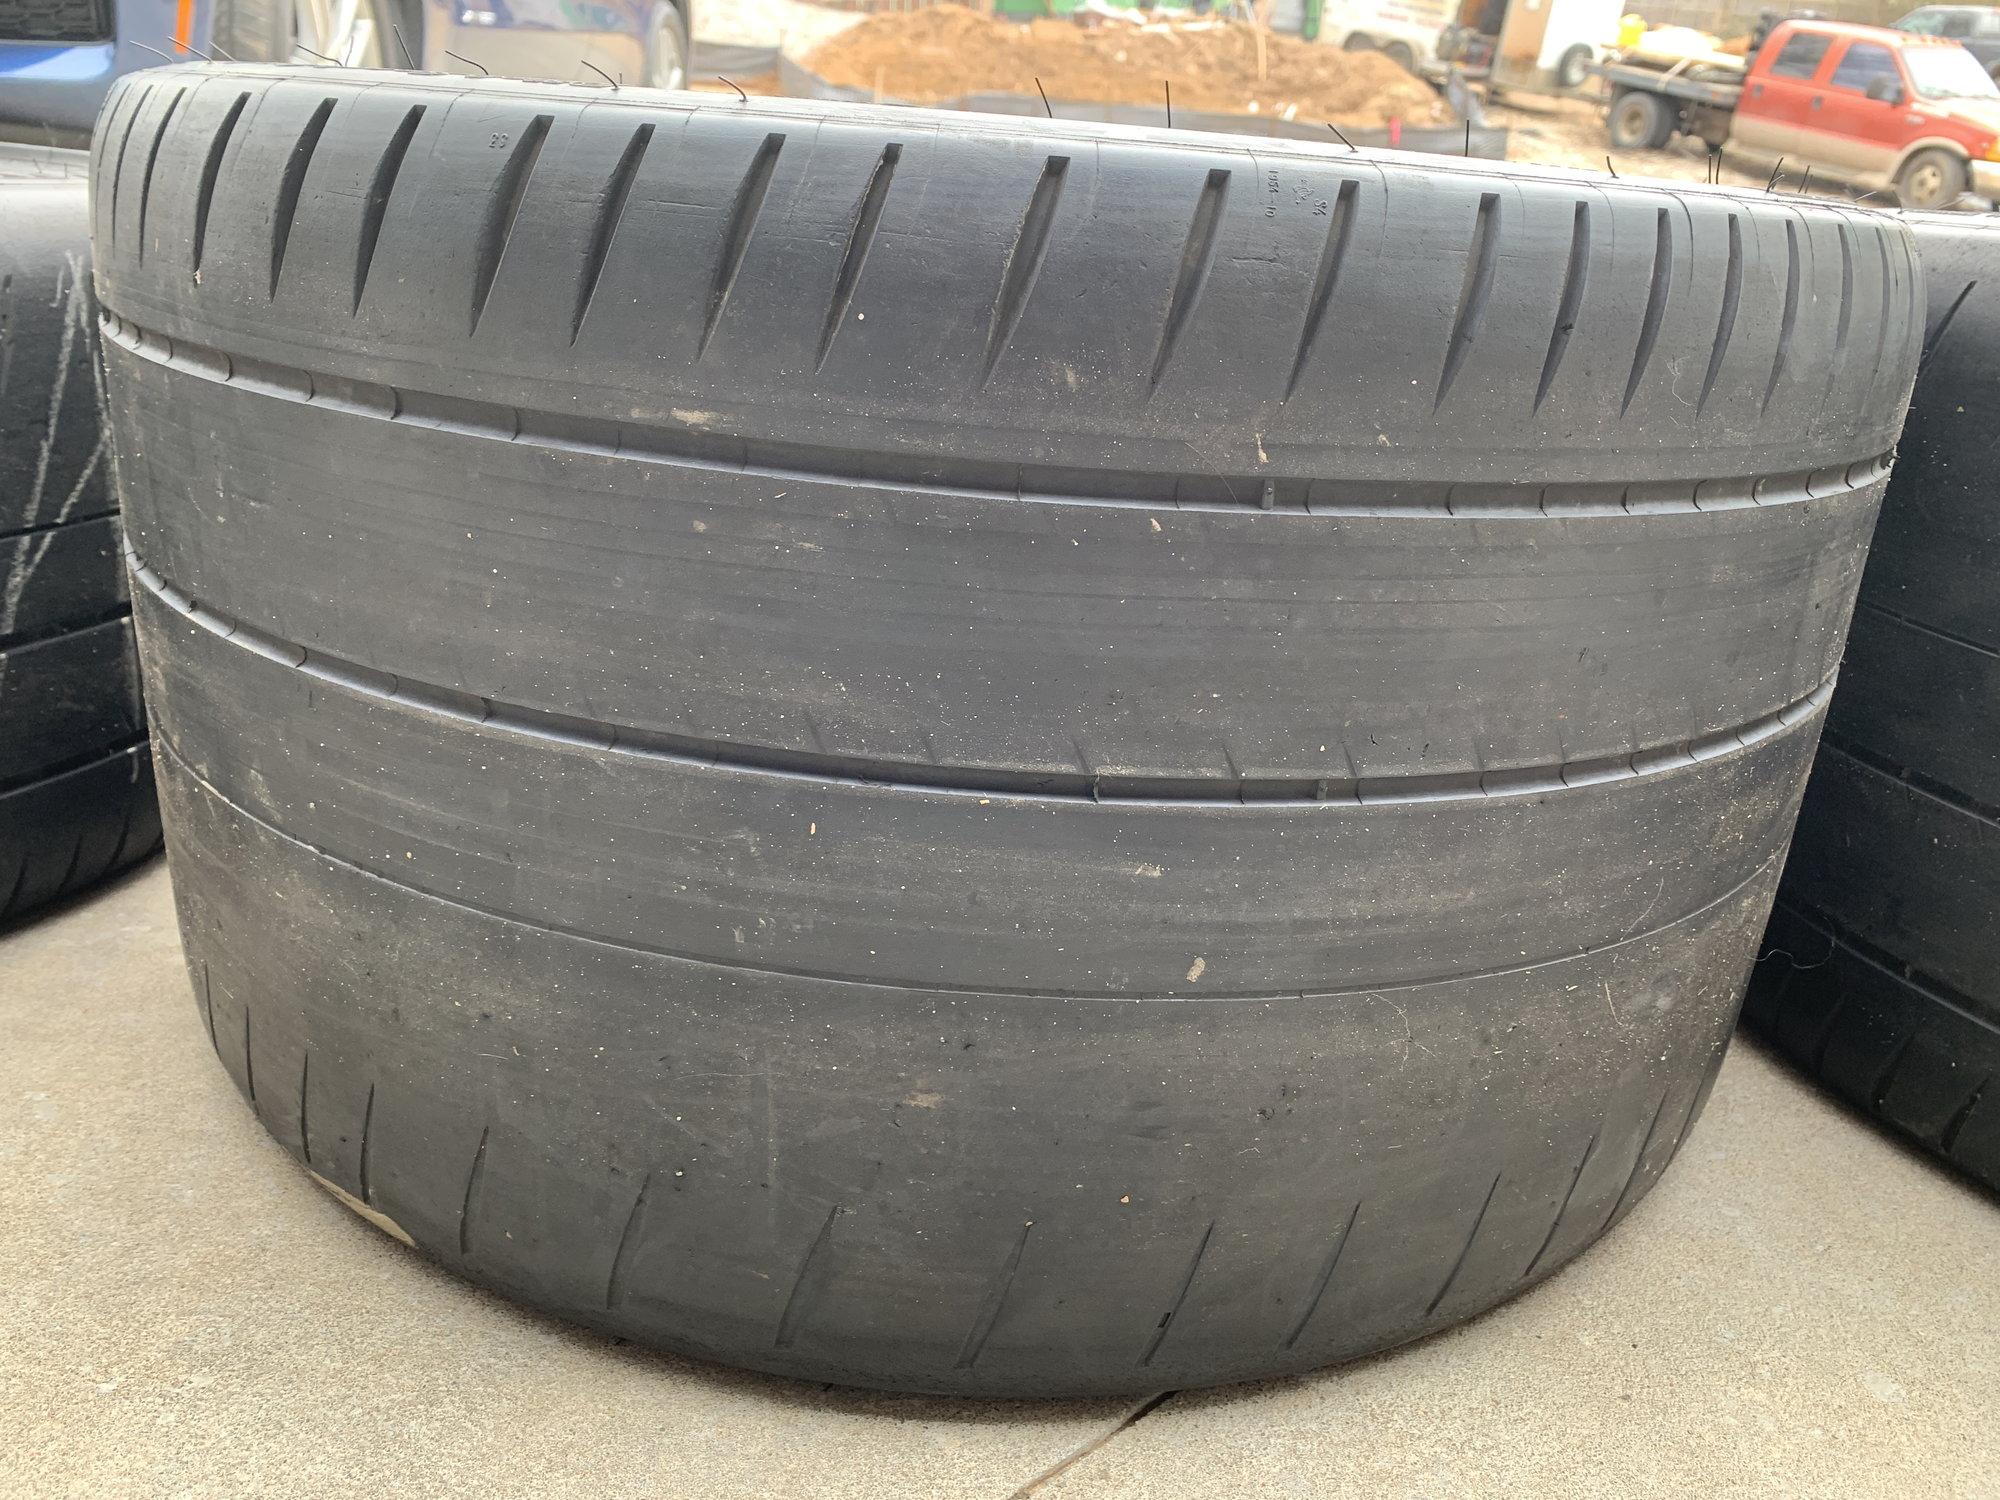 Discount Tire Tulsa >> FS (For Sale) 285/30/19 335/25/20 Michelin Pilot Sport Cup 2 - $750 Shipped - CorvetteForum ...